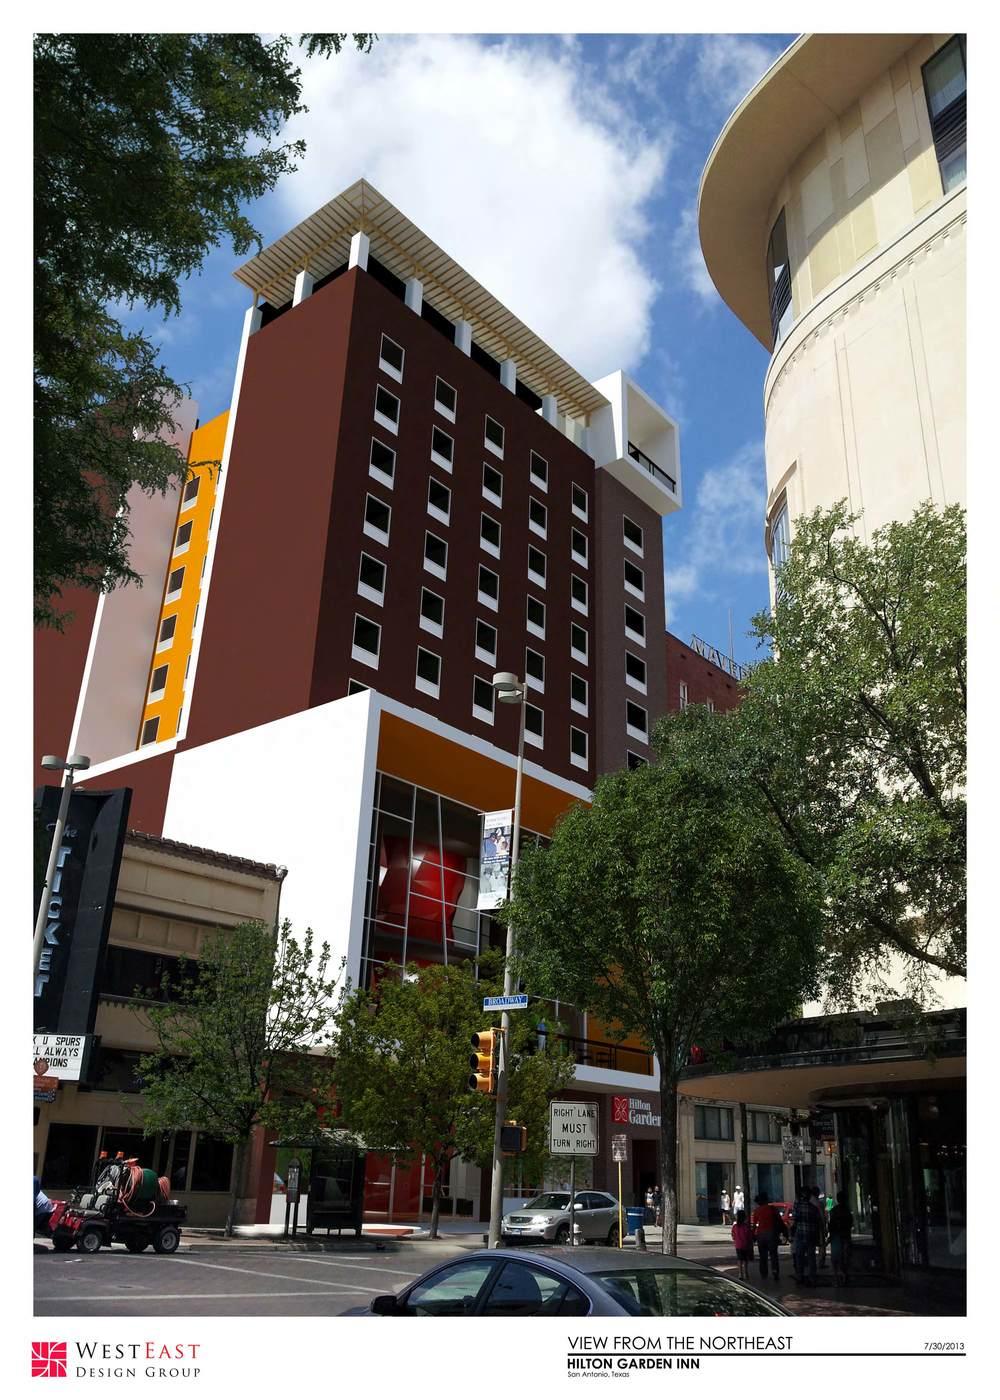 Hilton Garden Inn - Color Imagery - 2013-07-31_Page_03.jpg